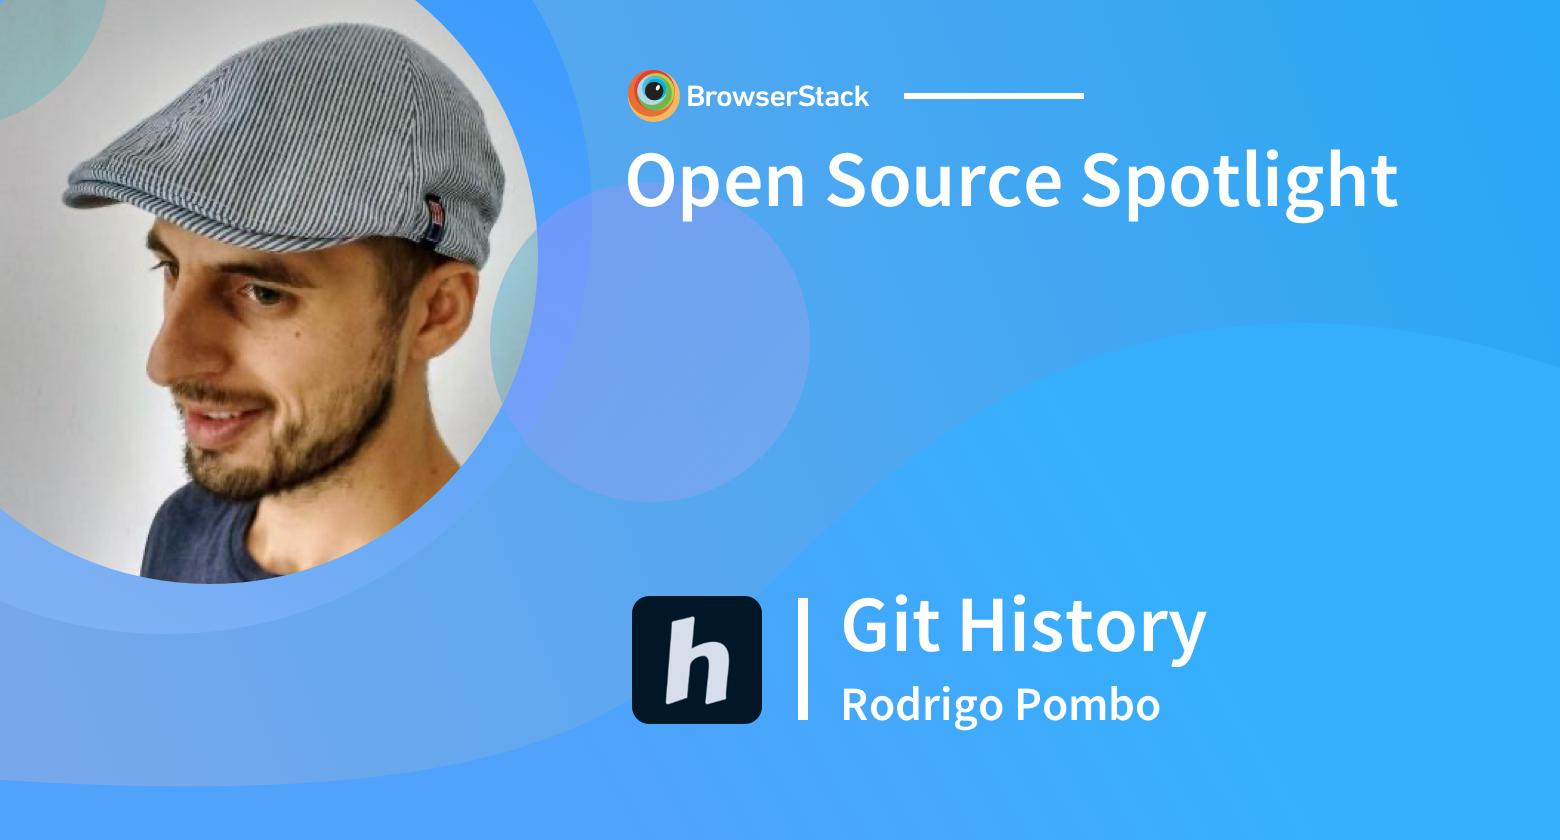 Open Source Spotlight: Git History with Rodrigo Pombo